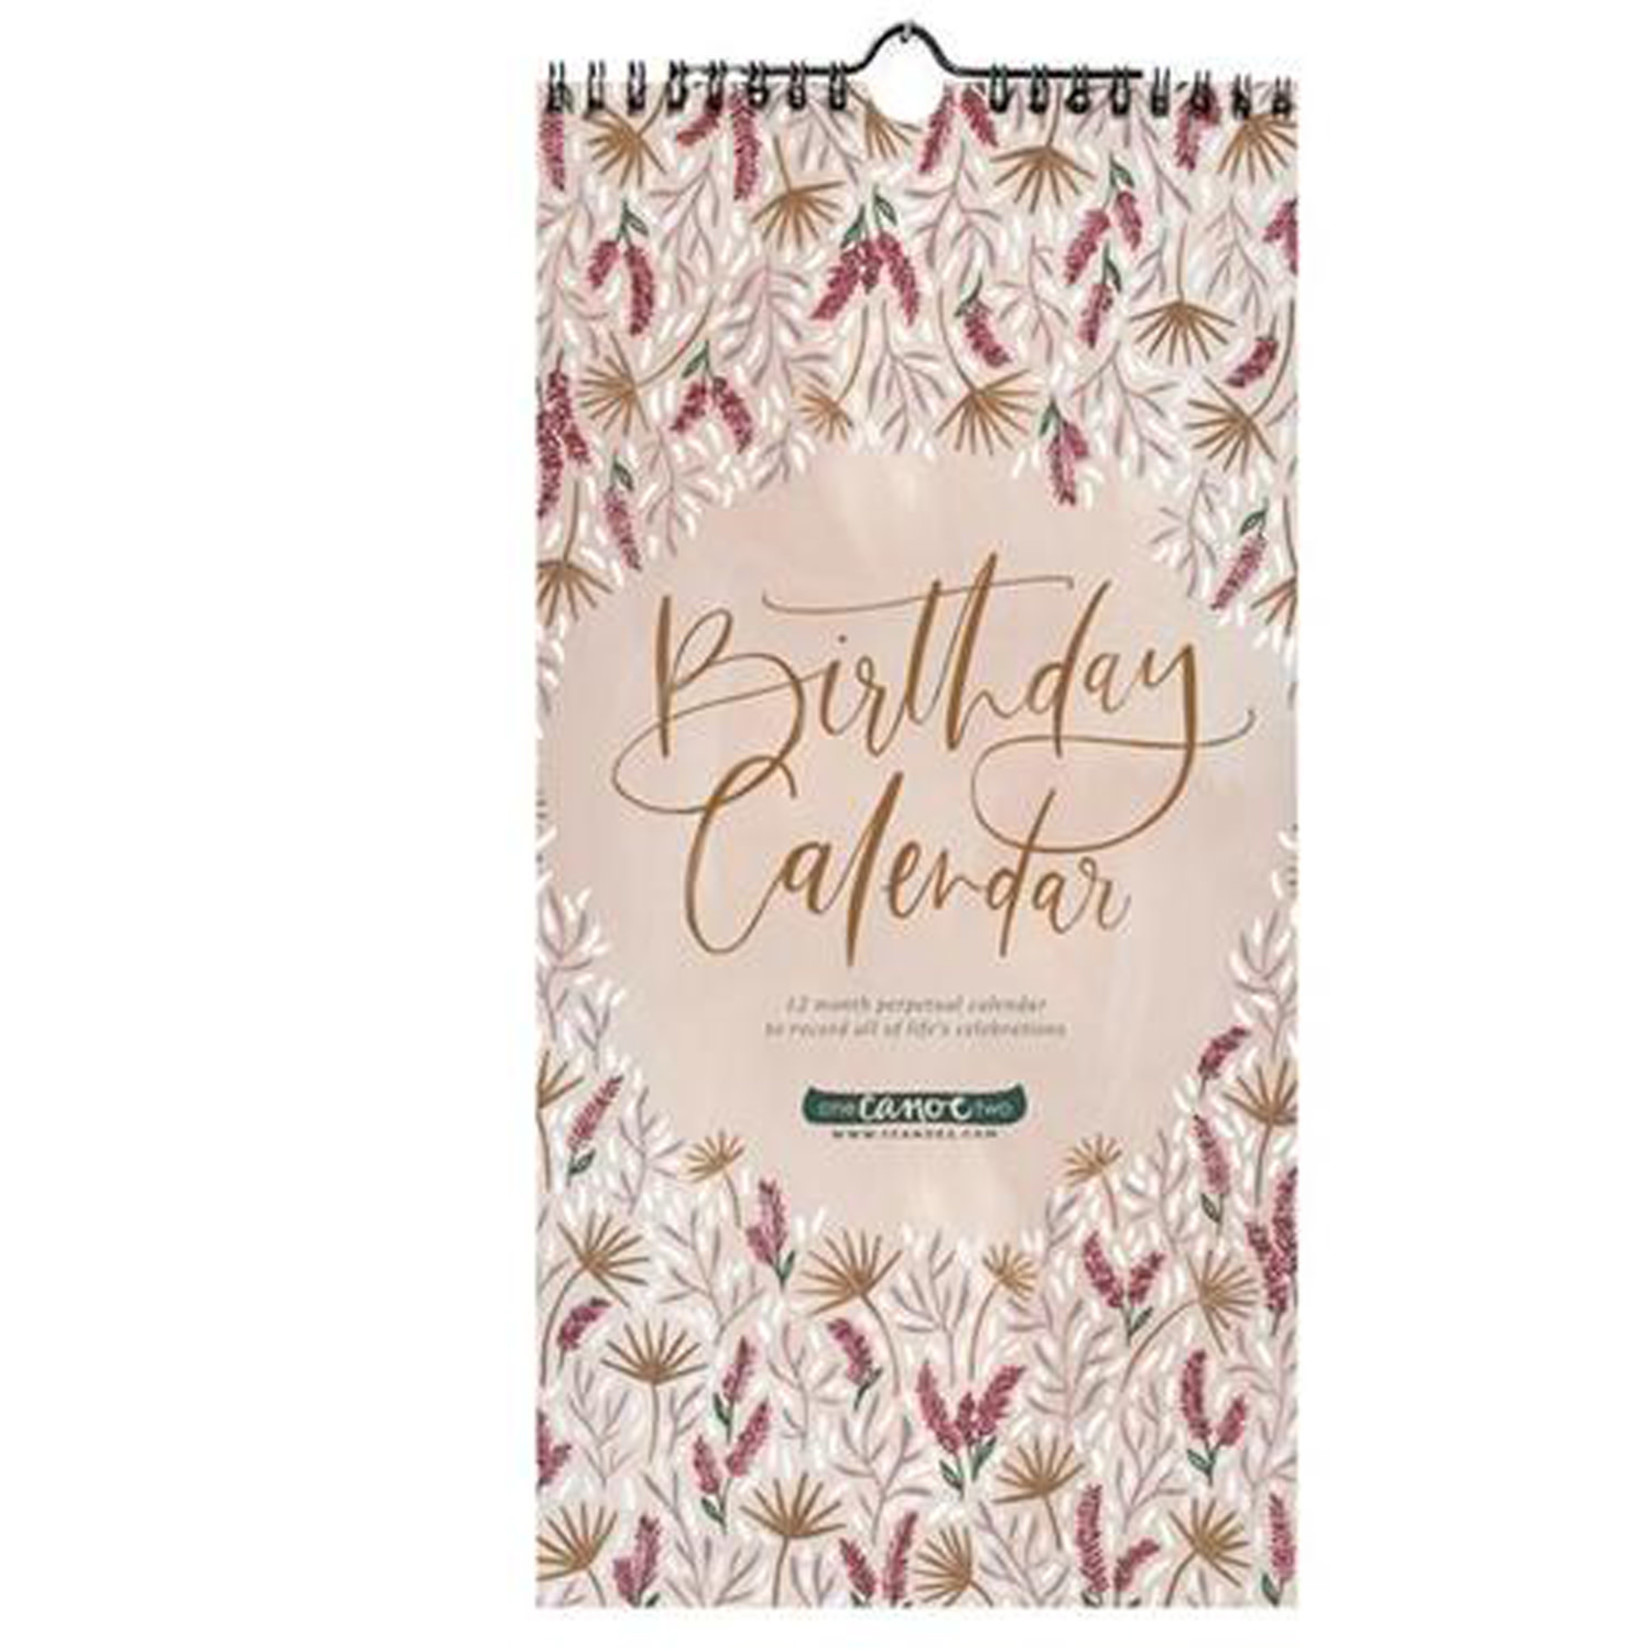 Meadow Birthday Calendar